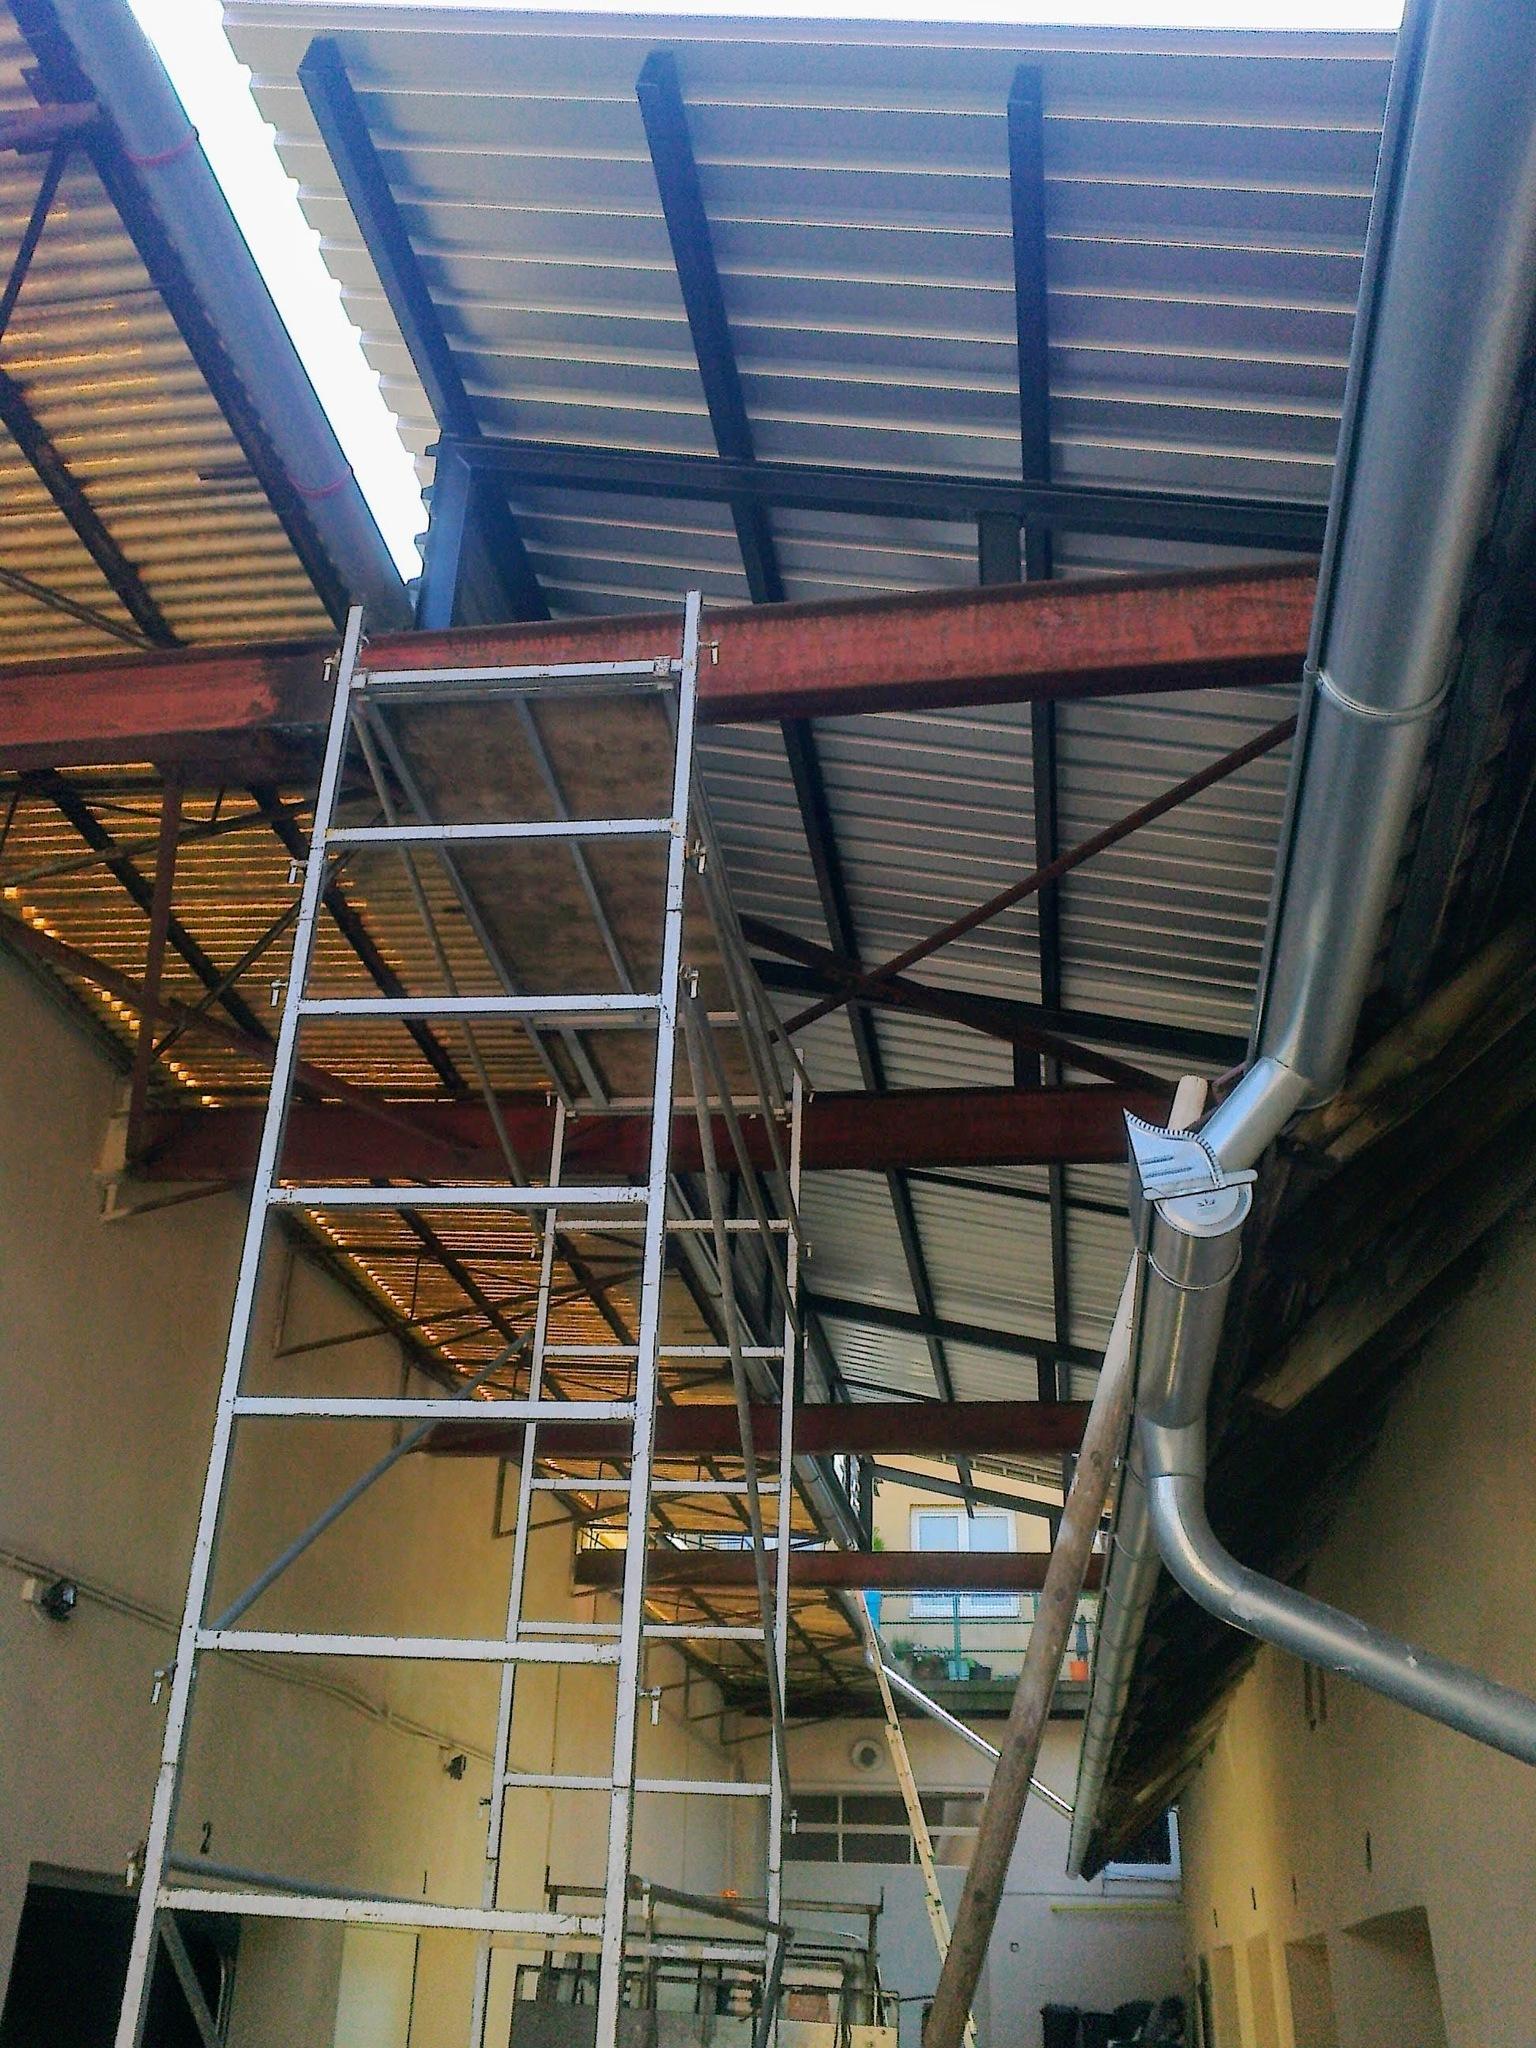 Stahldachkonstruktion, schwarz matt., Wellplatten